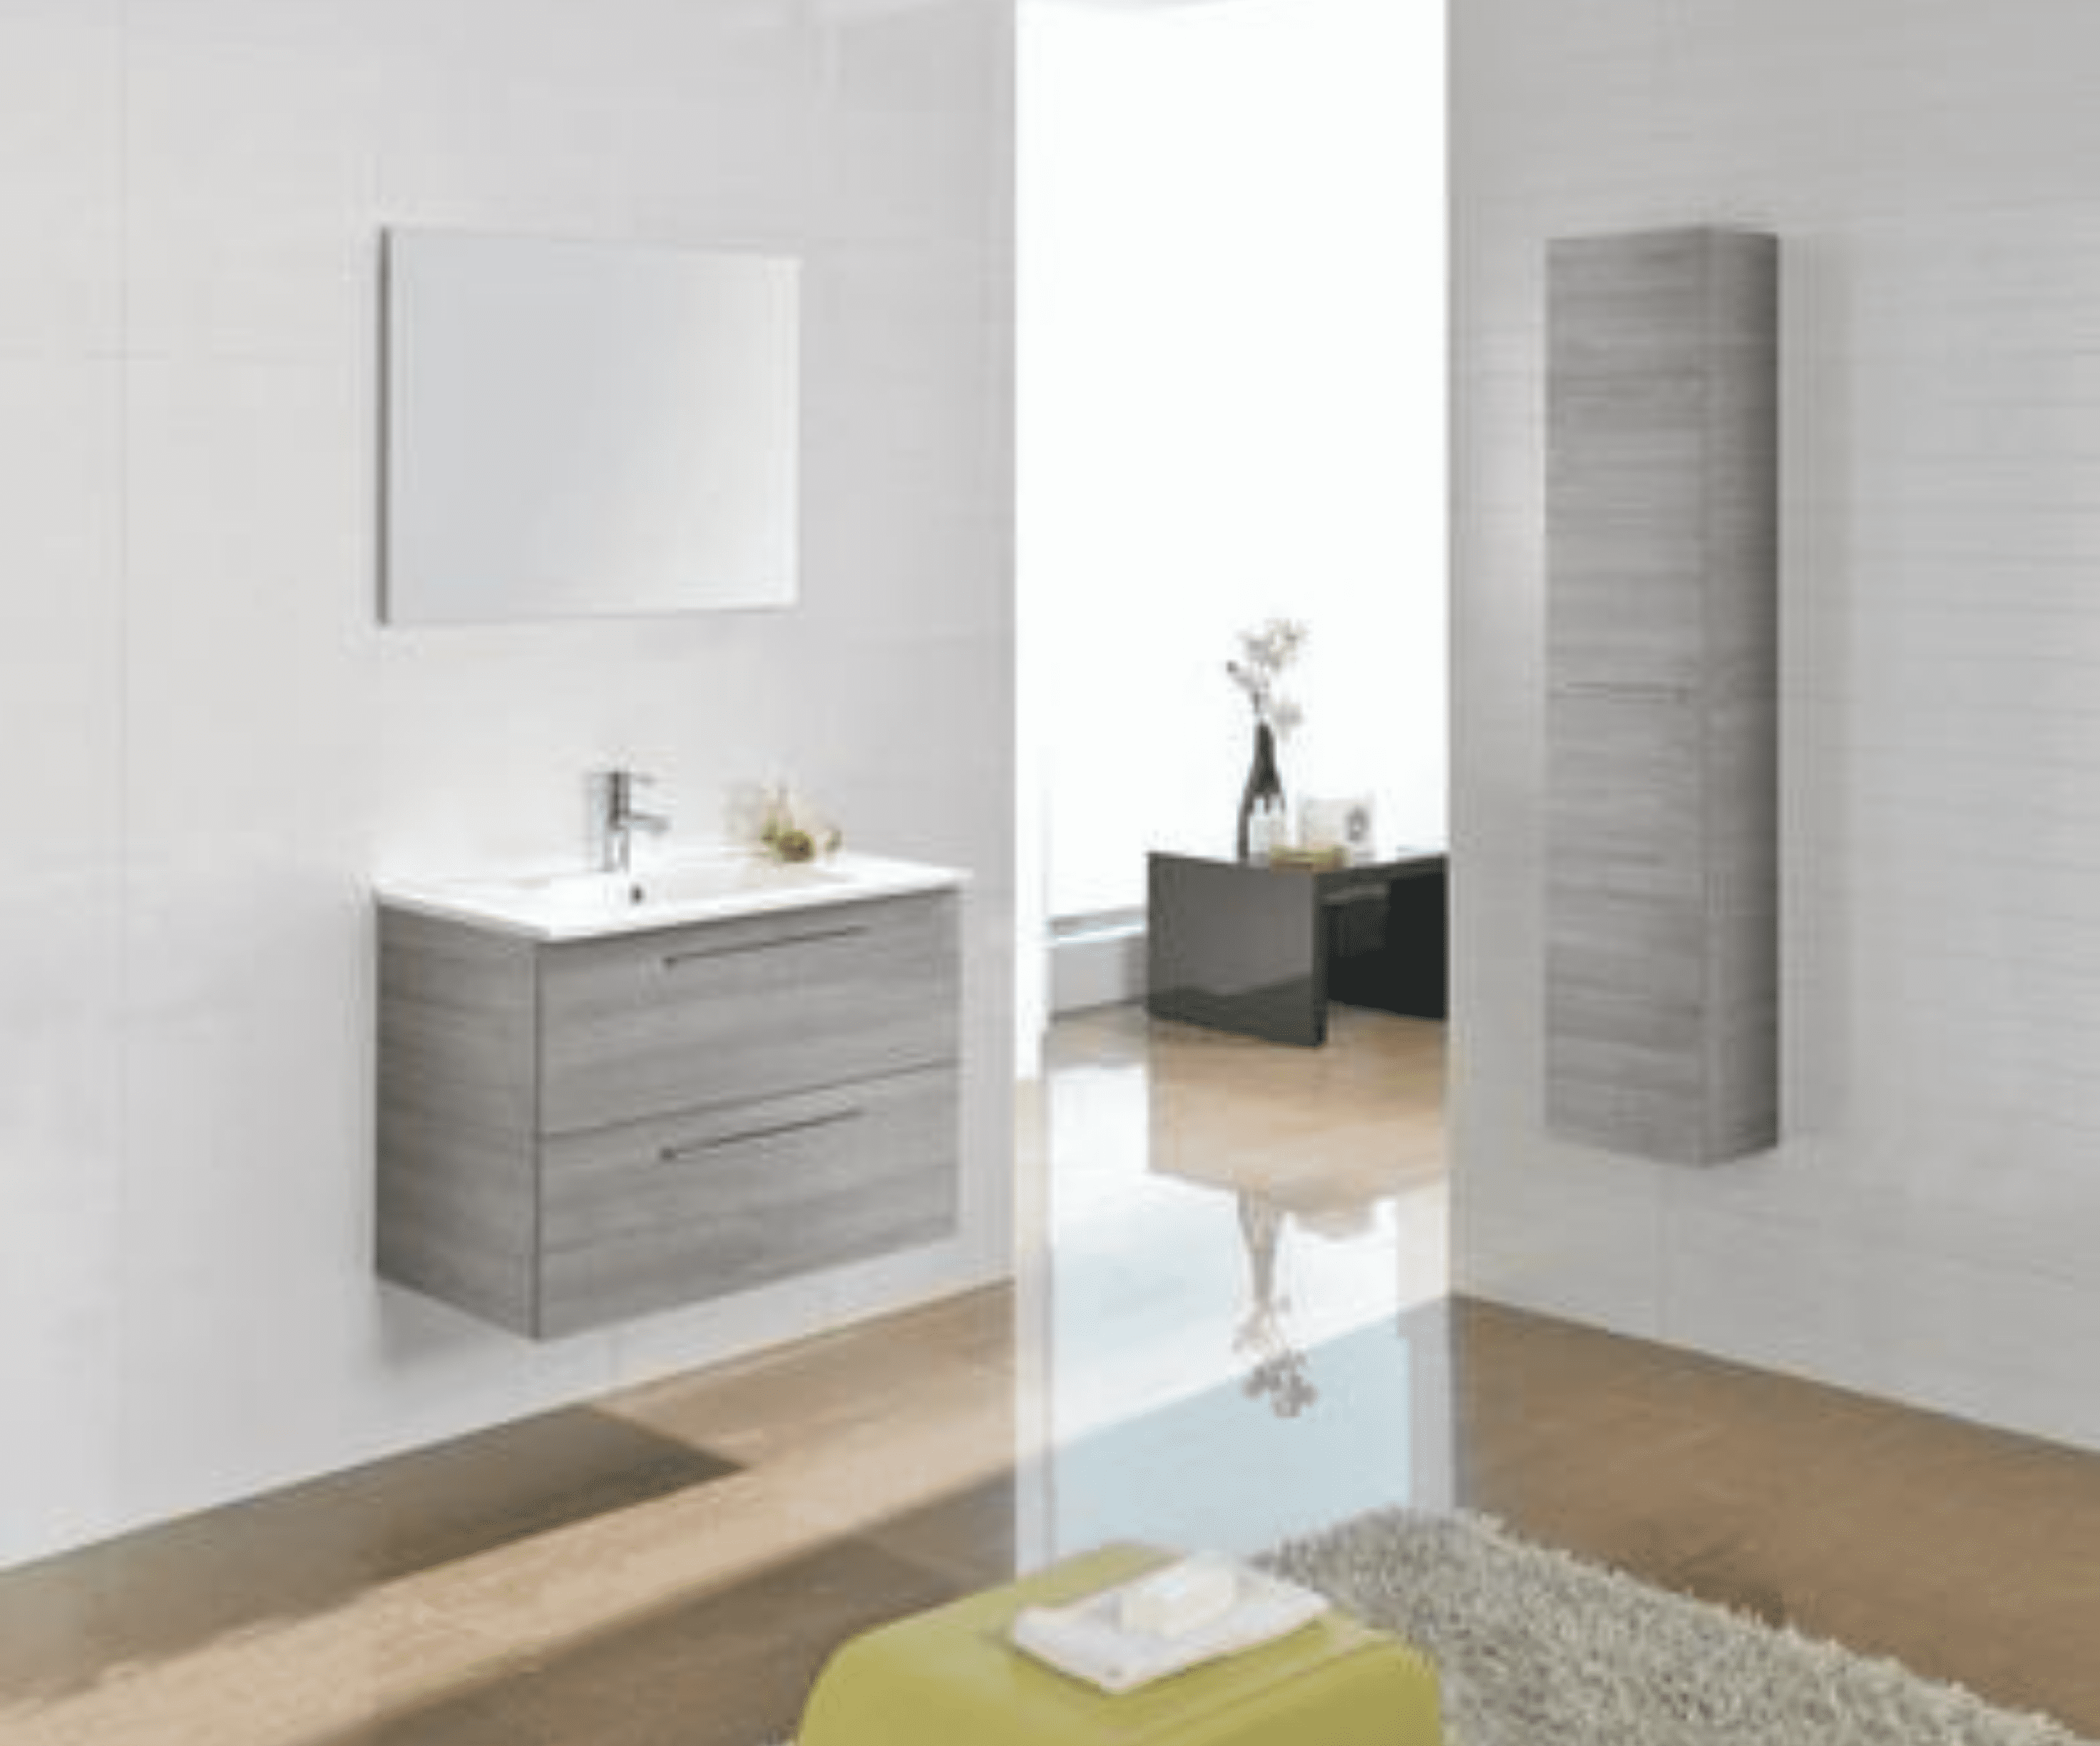 Meubles de salle de bains Level